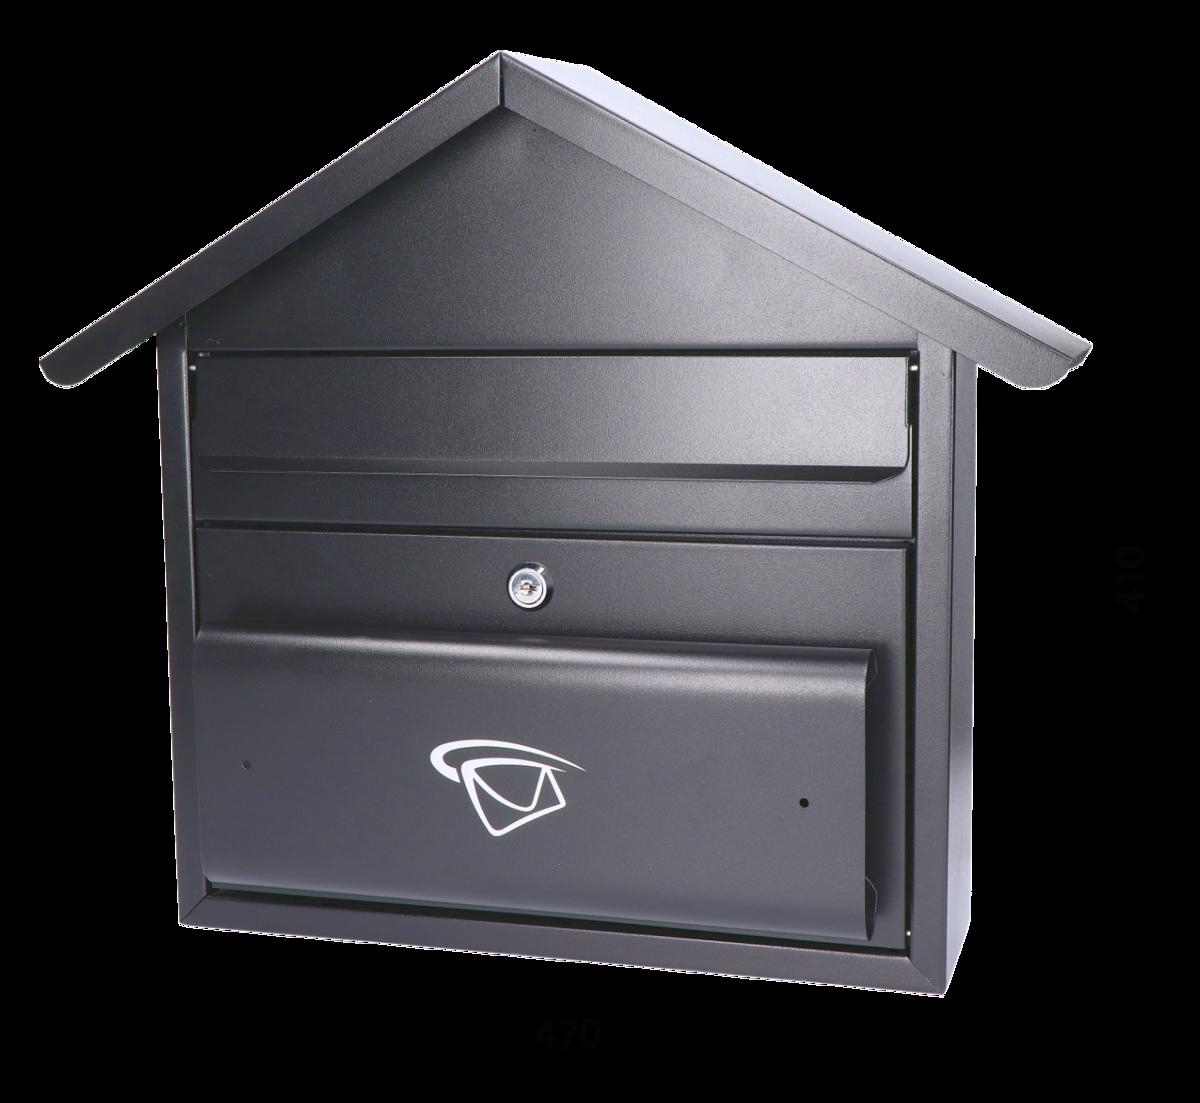 461fa0951 Schránka poštová 470x410x110mm, max. formát listu:C4, čierna matná